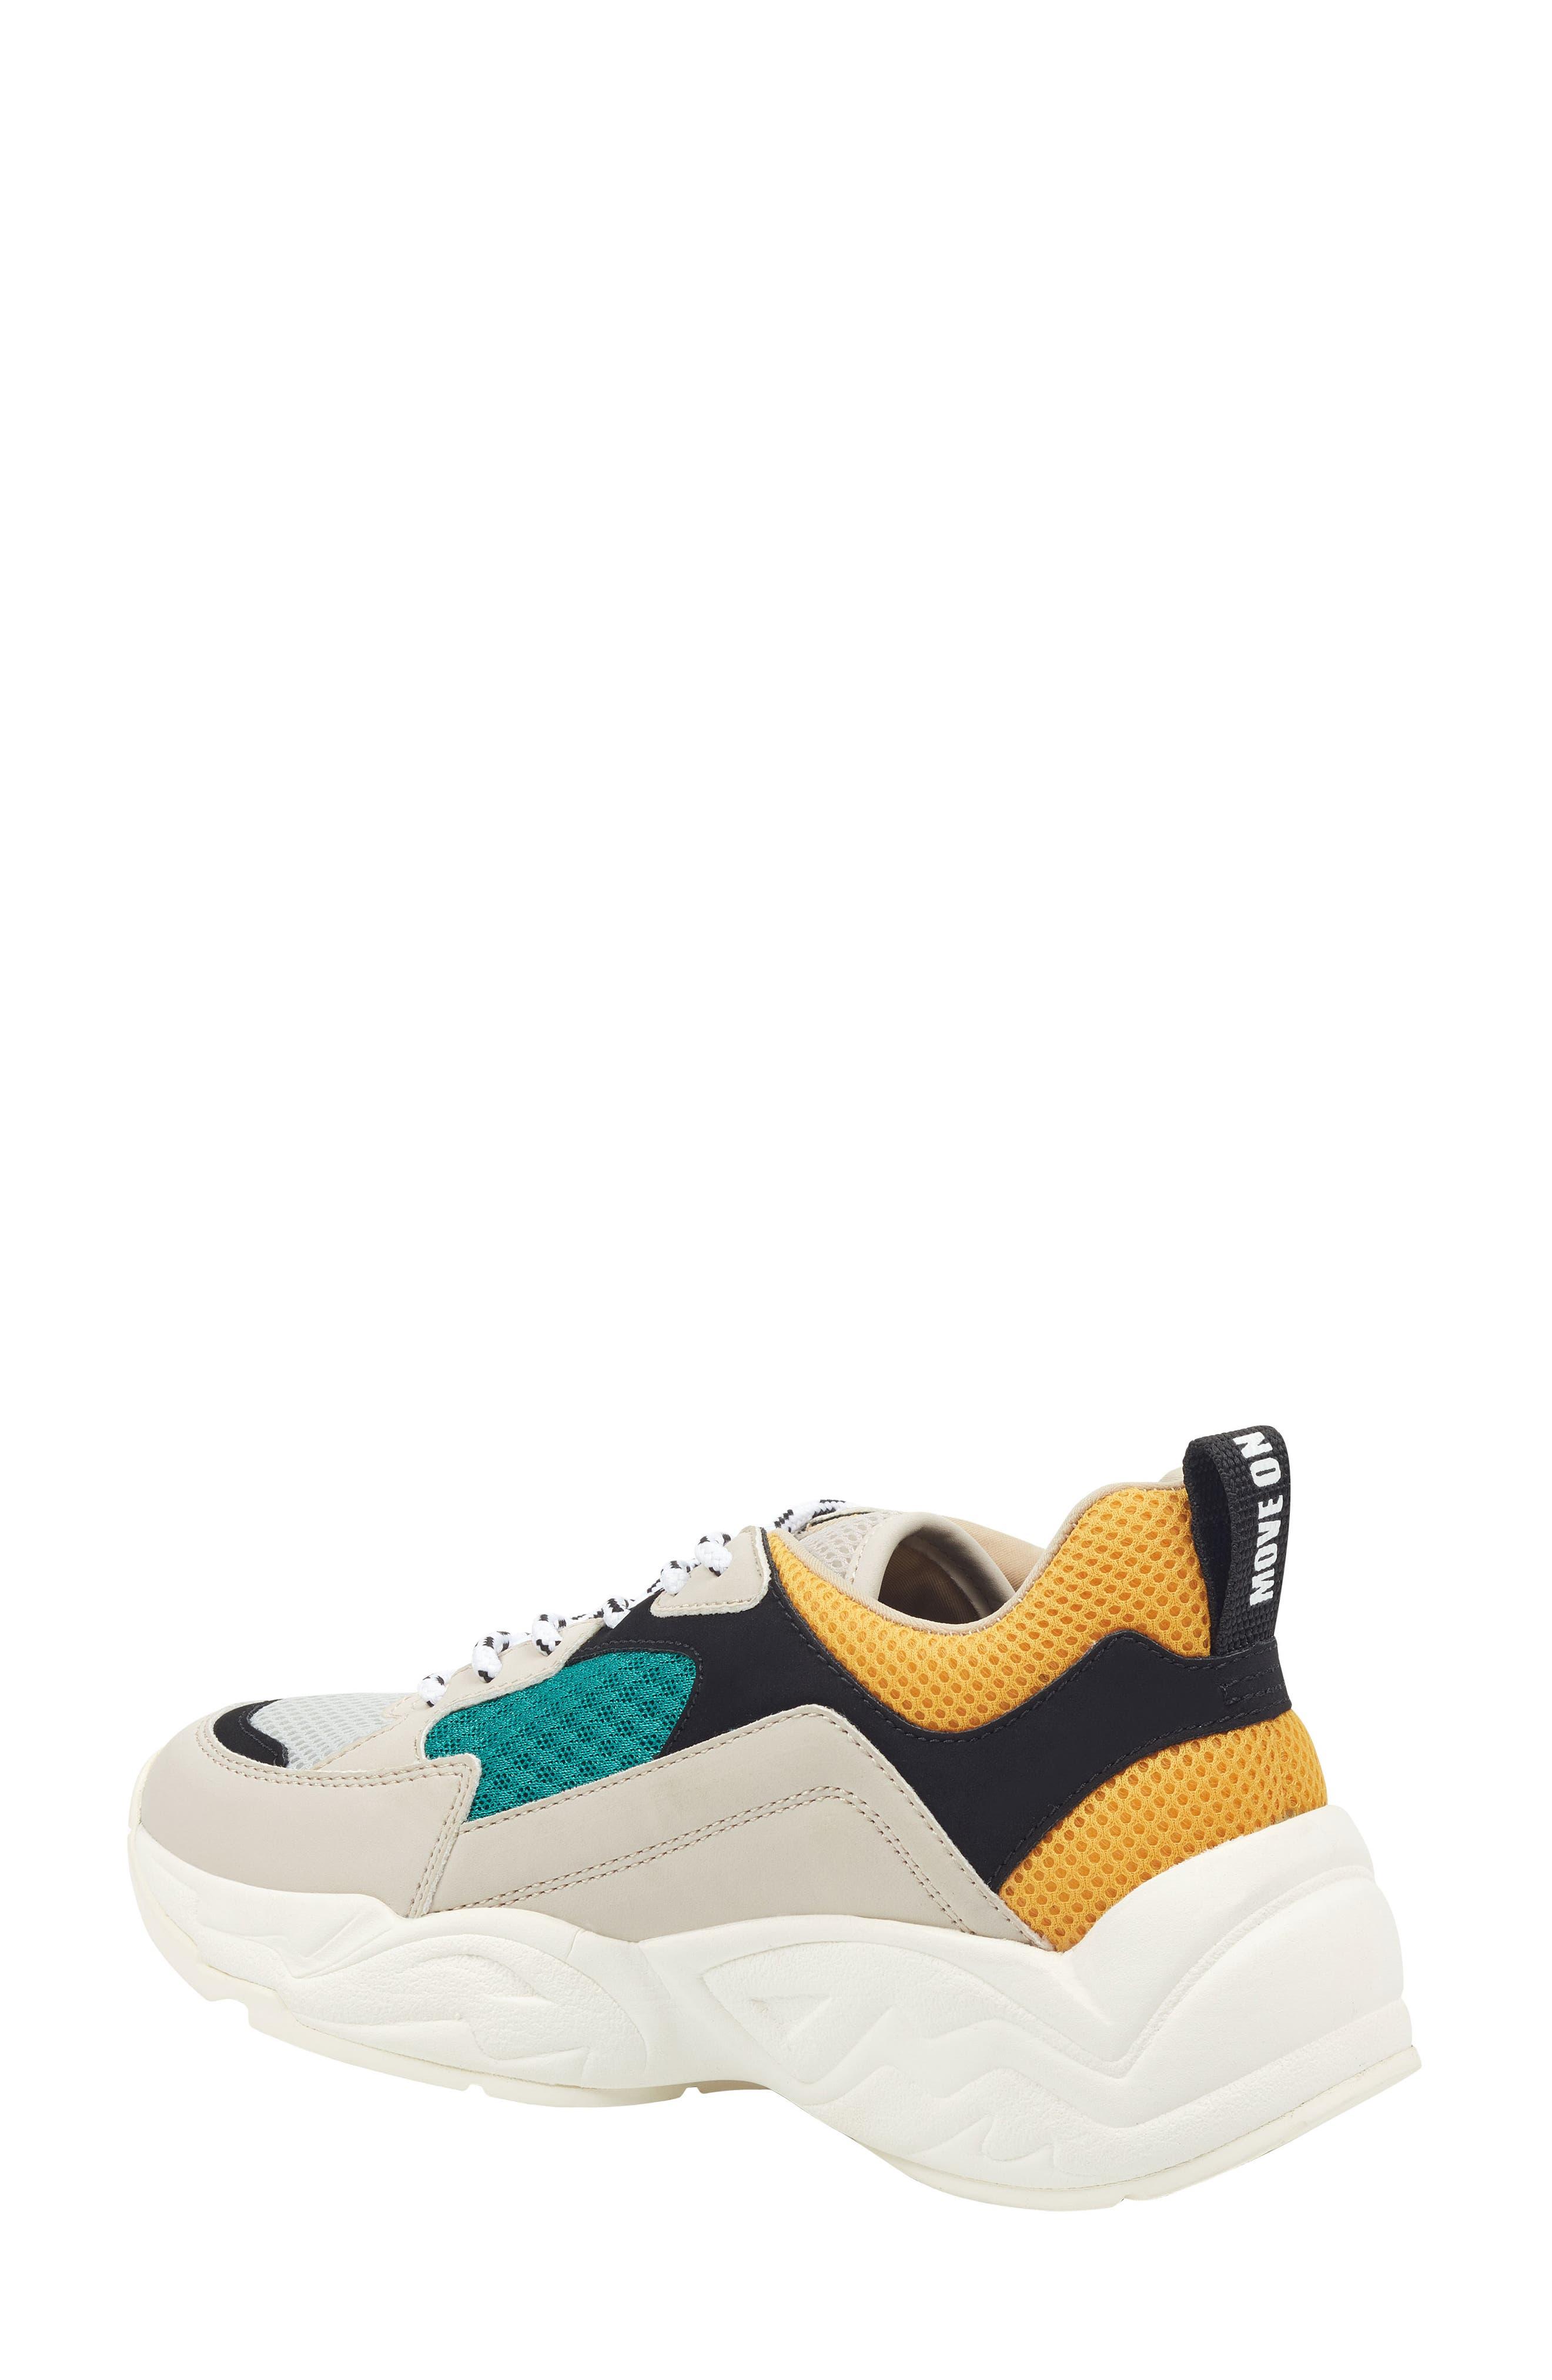 KENDALL + KYLIE,                             Dad Sneaker,                             Alternate thumbnail 2, color,                             250